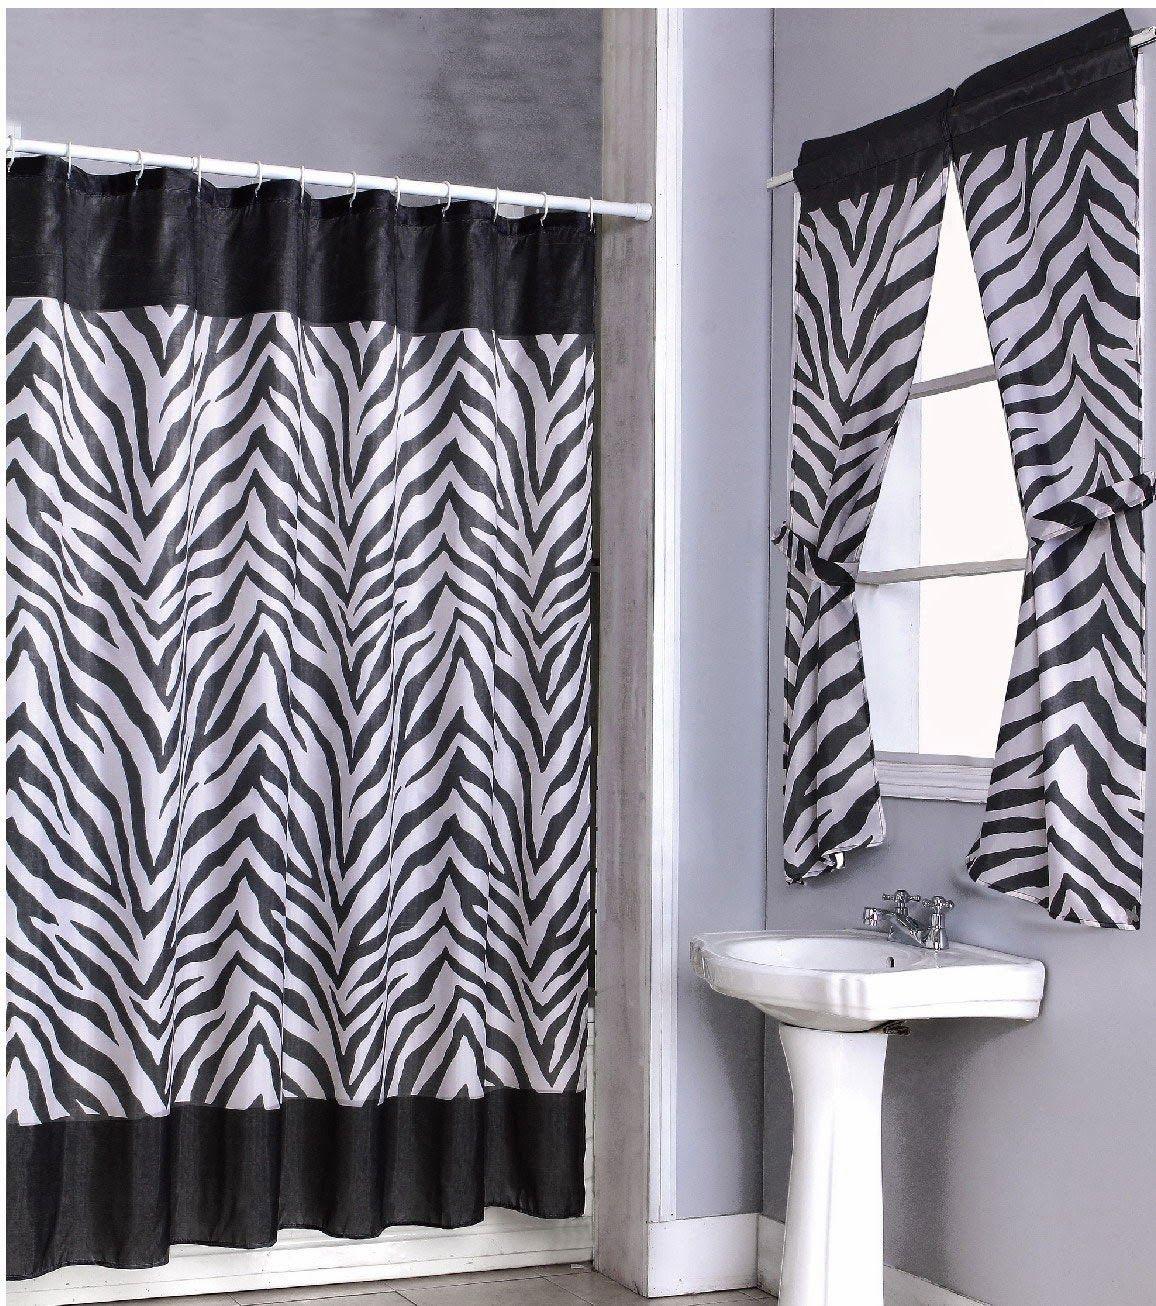 Zebra window curtains - Curtain Ideas Zebra Bathroom Window Curtains